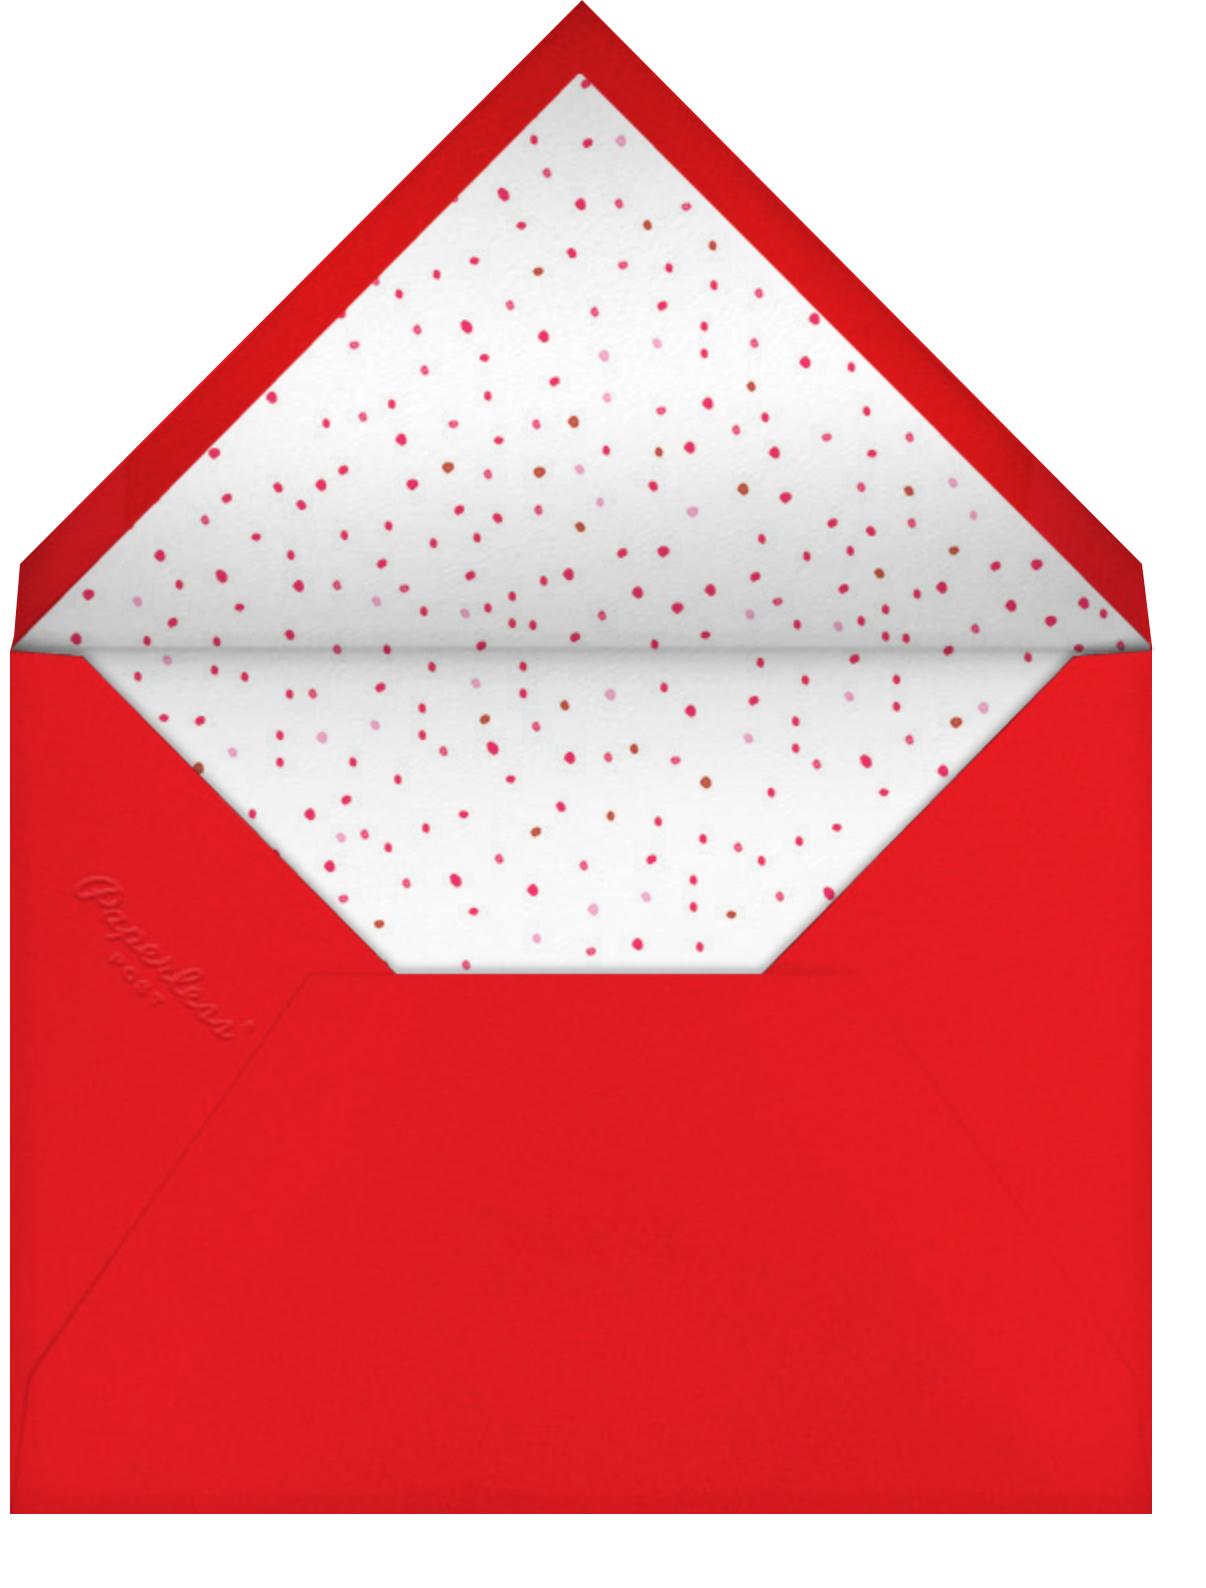 Jeweled Toast - Fair - Mr. Boddington's Studio - Envelope